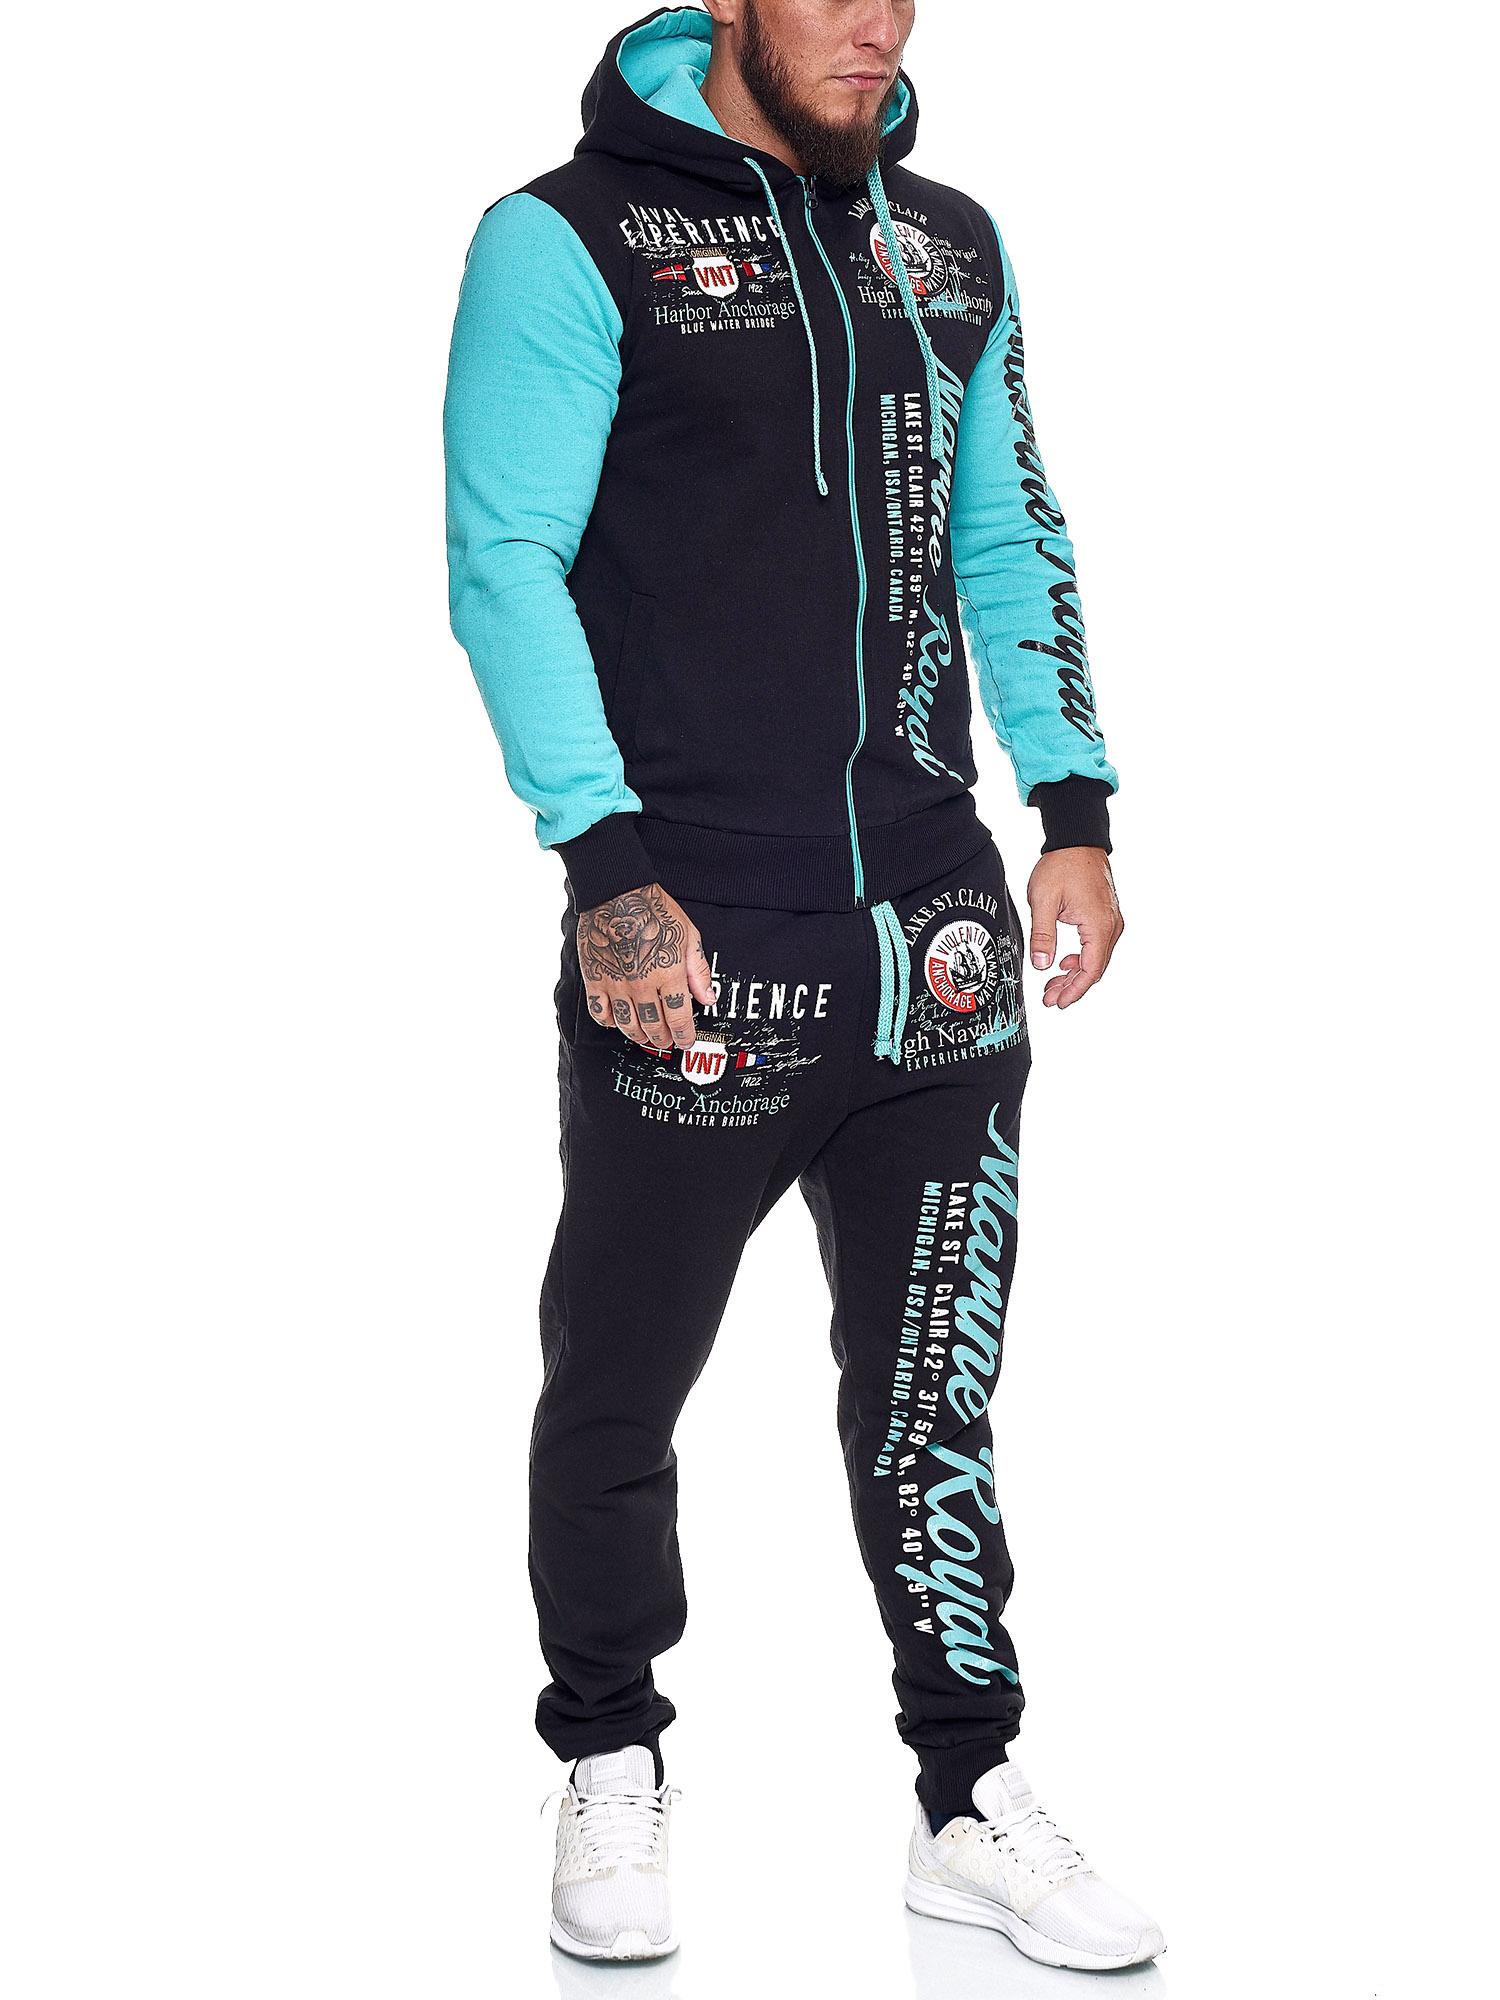 Damen-Jogginganzug-Frauen-Trainingsanzug-Sportanzug-Streetwear-JG-512-John-Kayna Indexbild 43